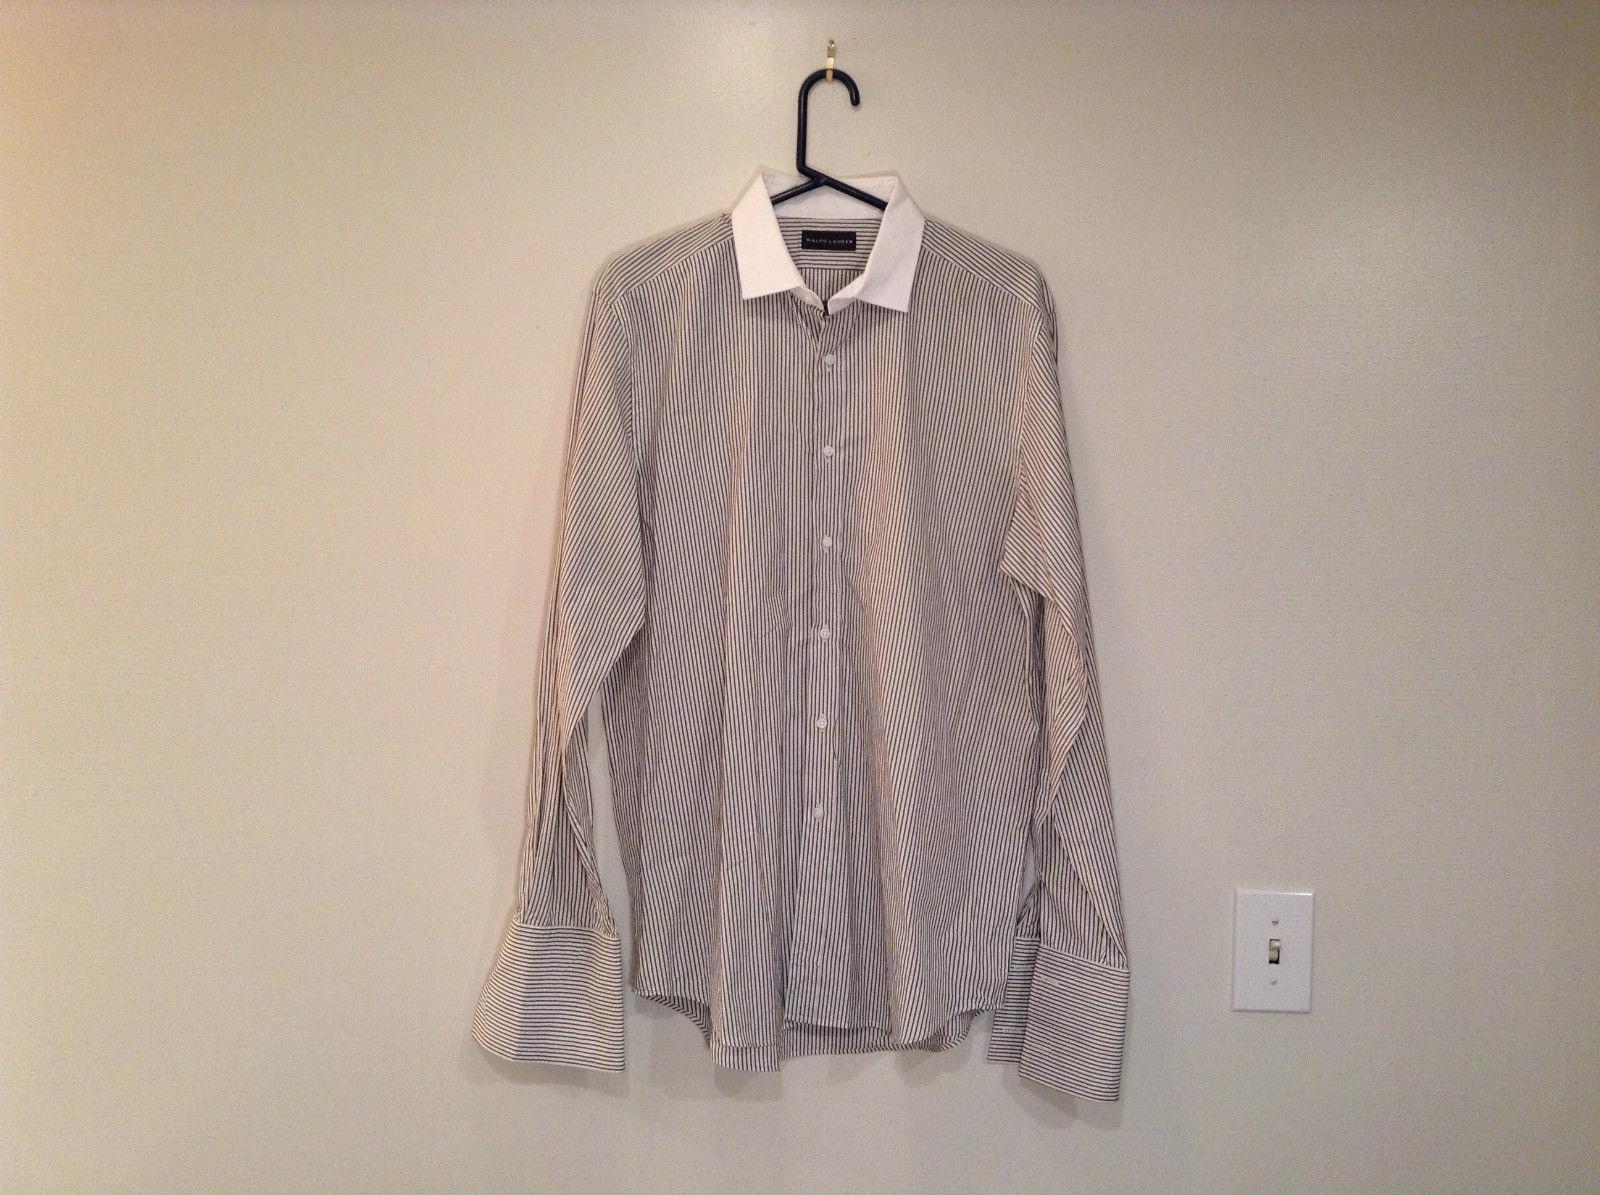 Nice White with Black Stripes Long Sleeve Dress Shirt Ralph Lauren Size 16.5